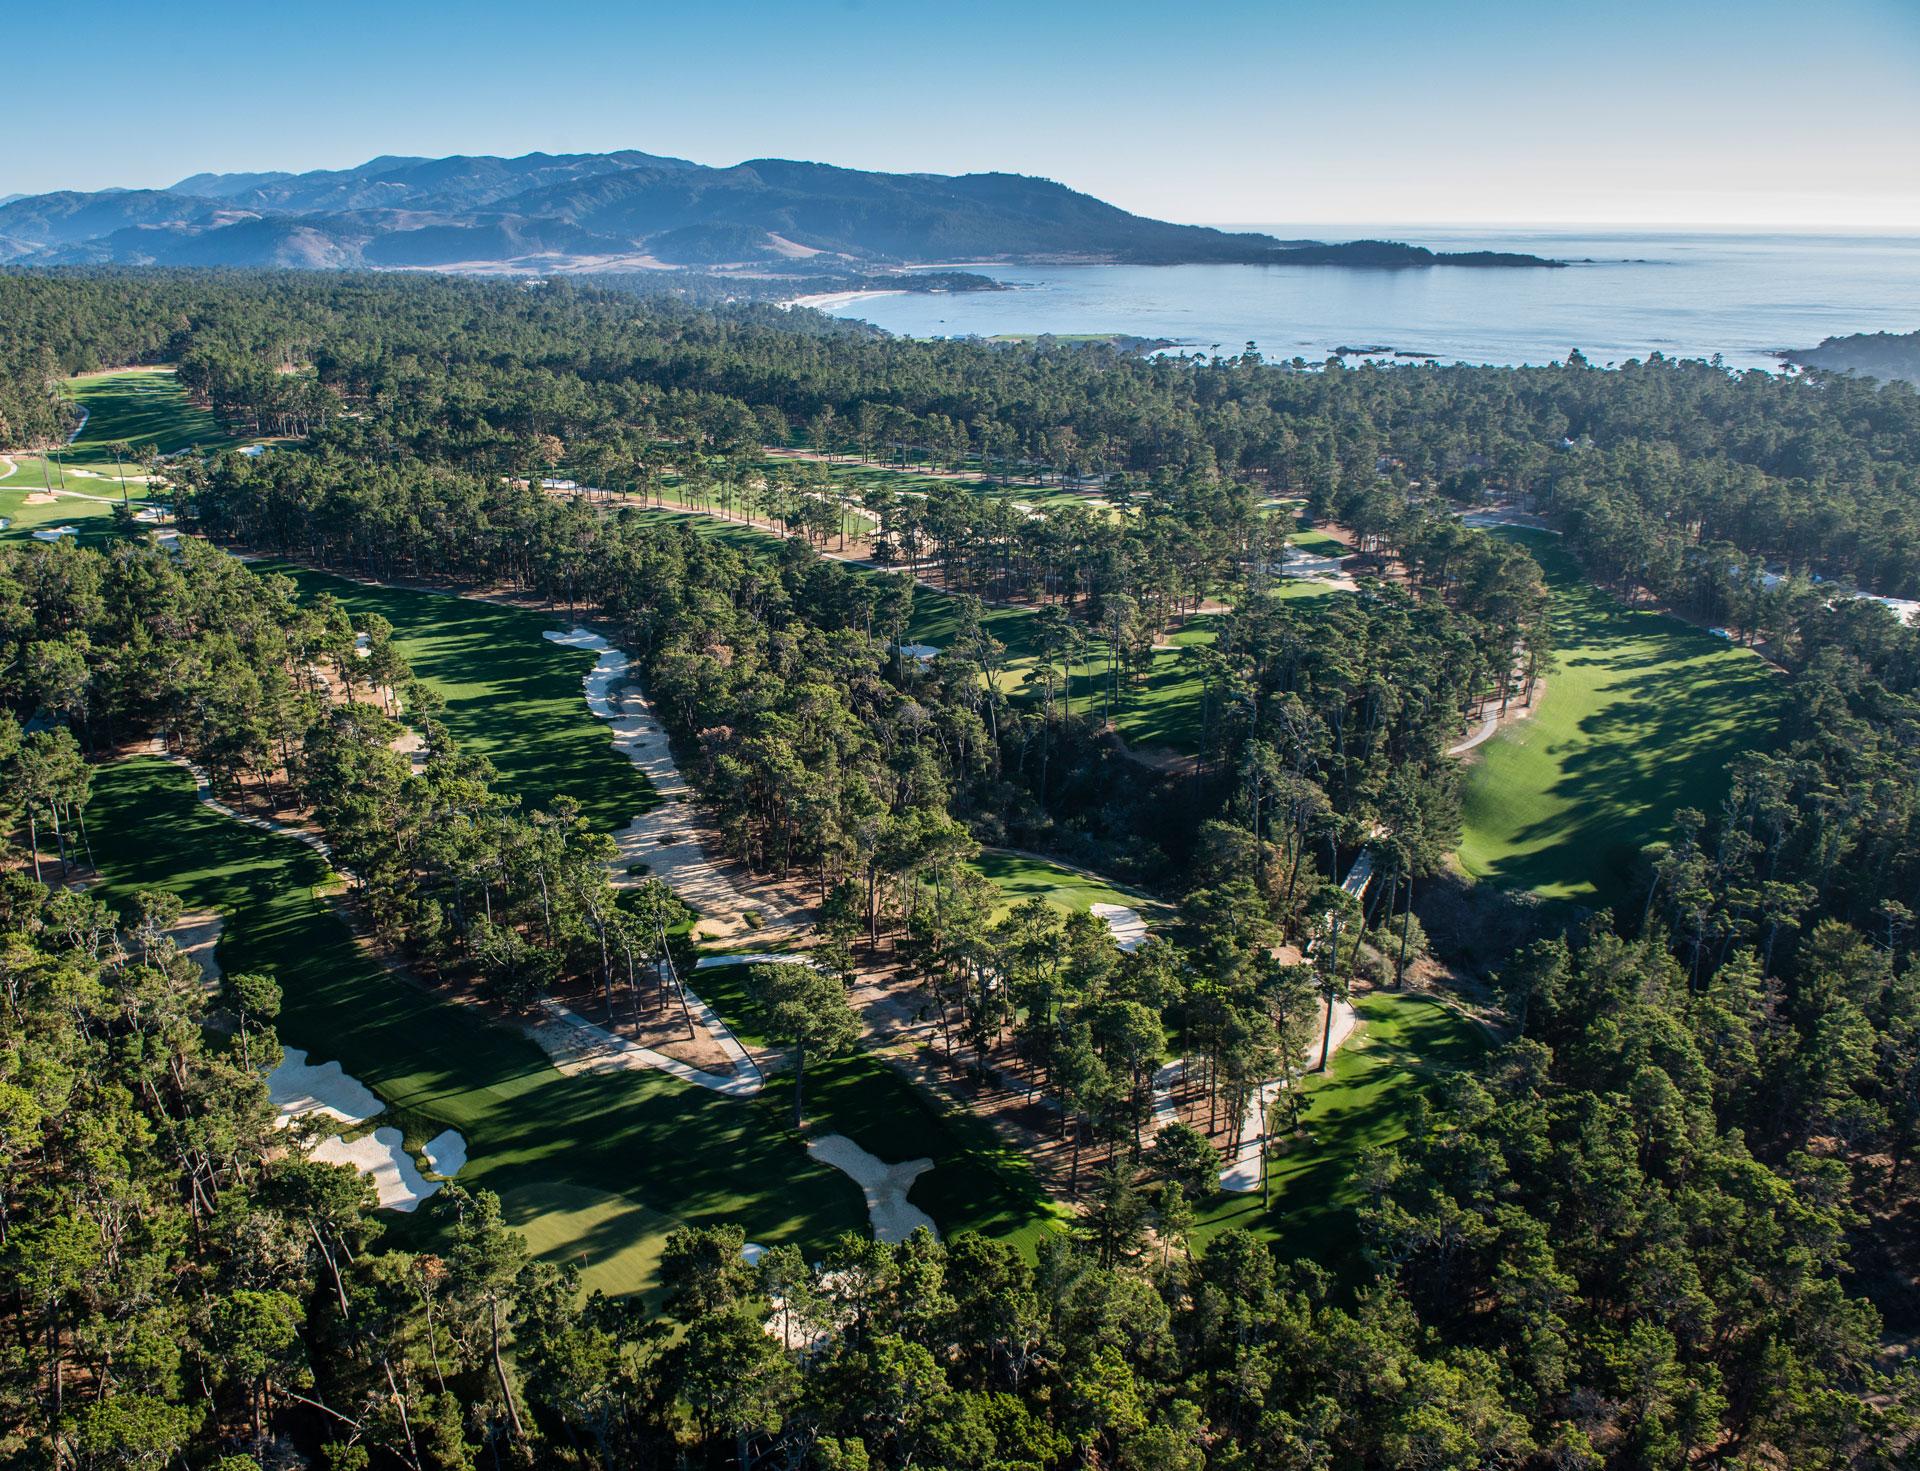 Pebble Beach Golf at Poppy Hills Golf Course